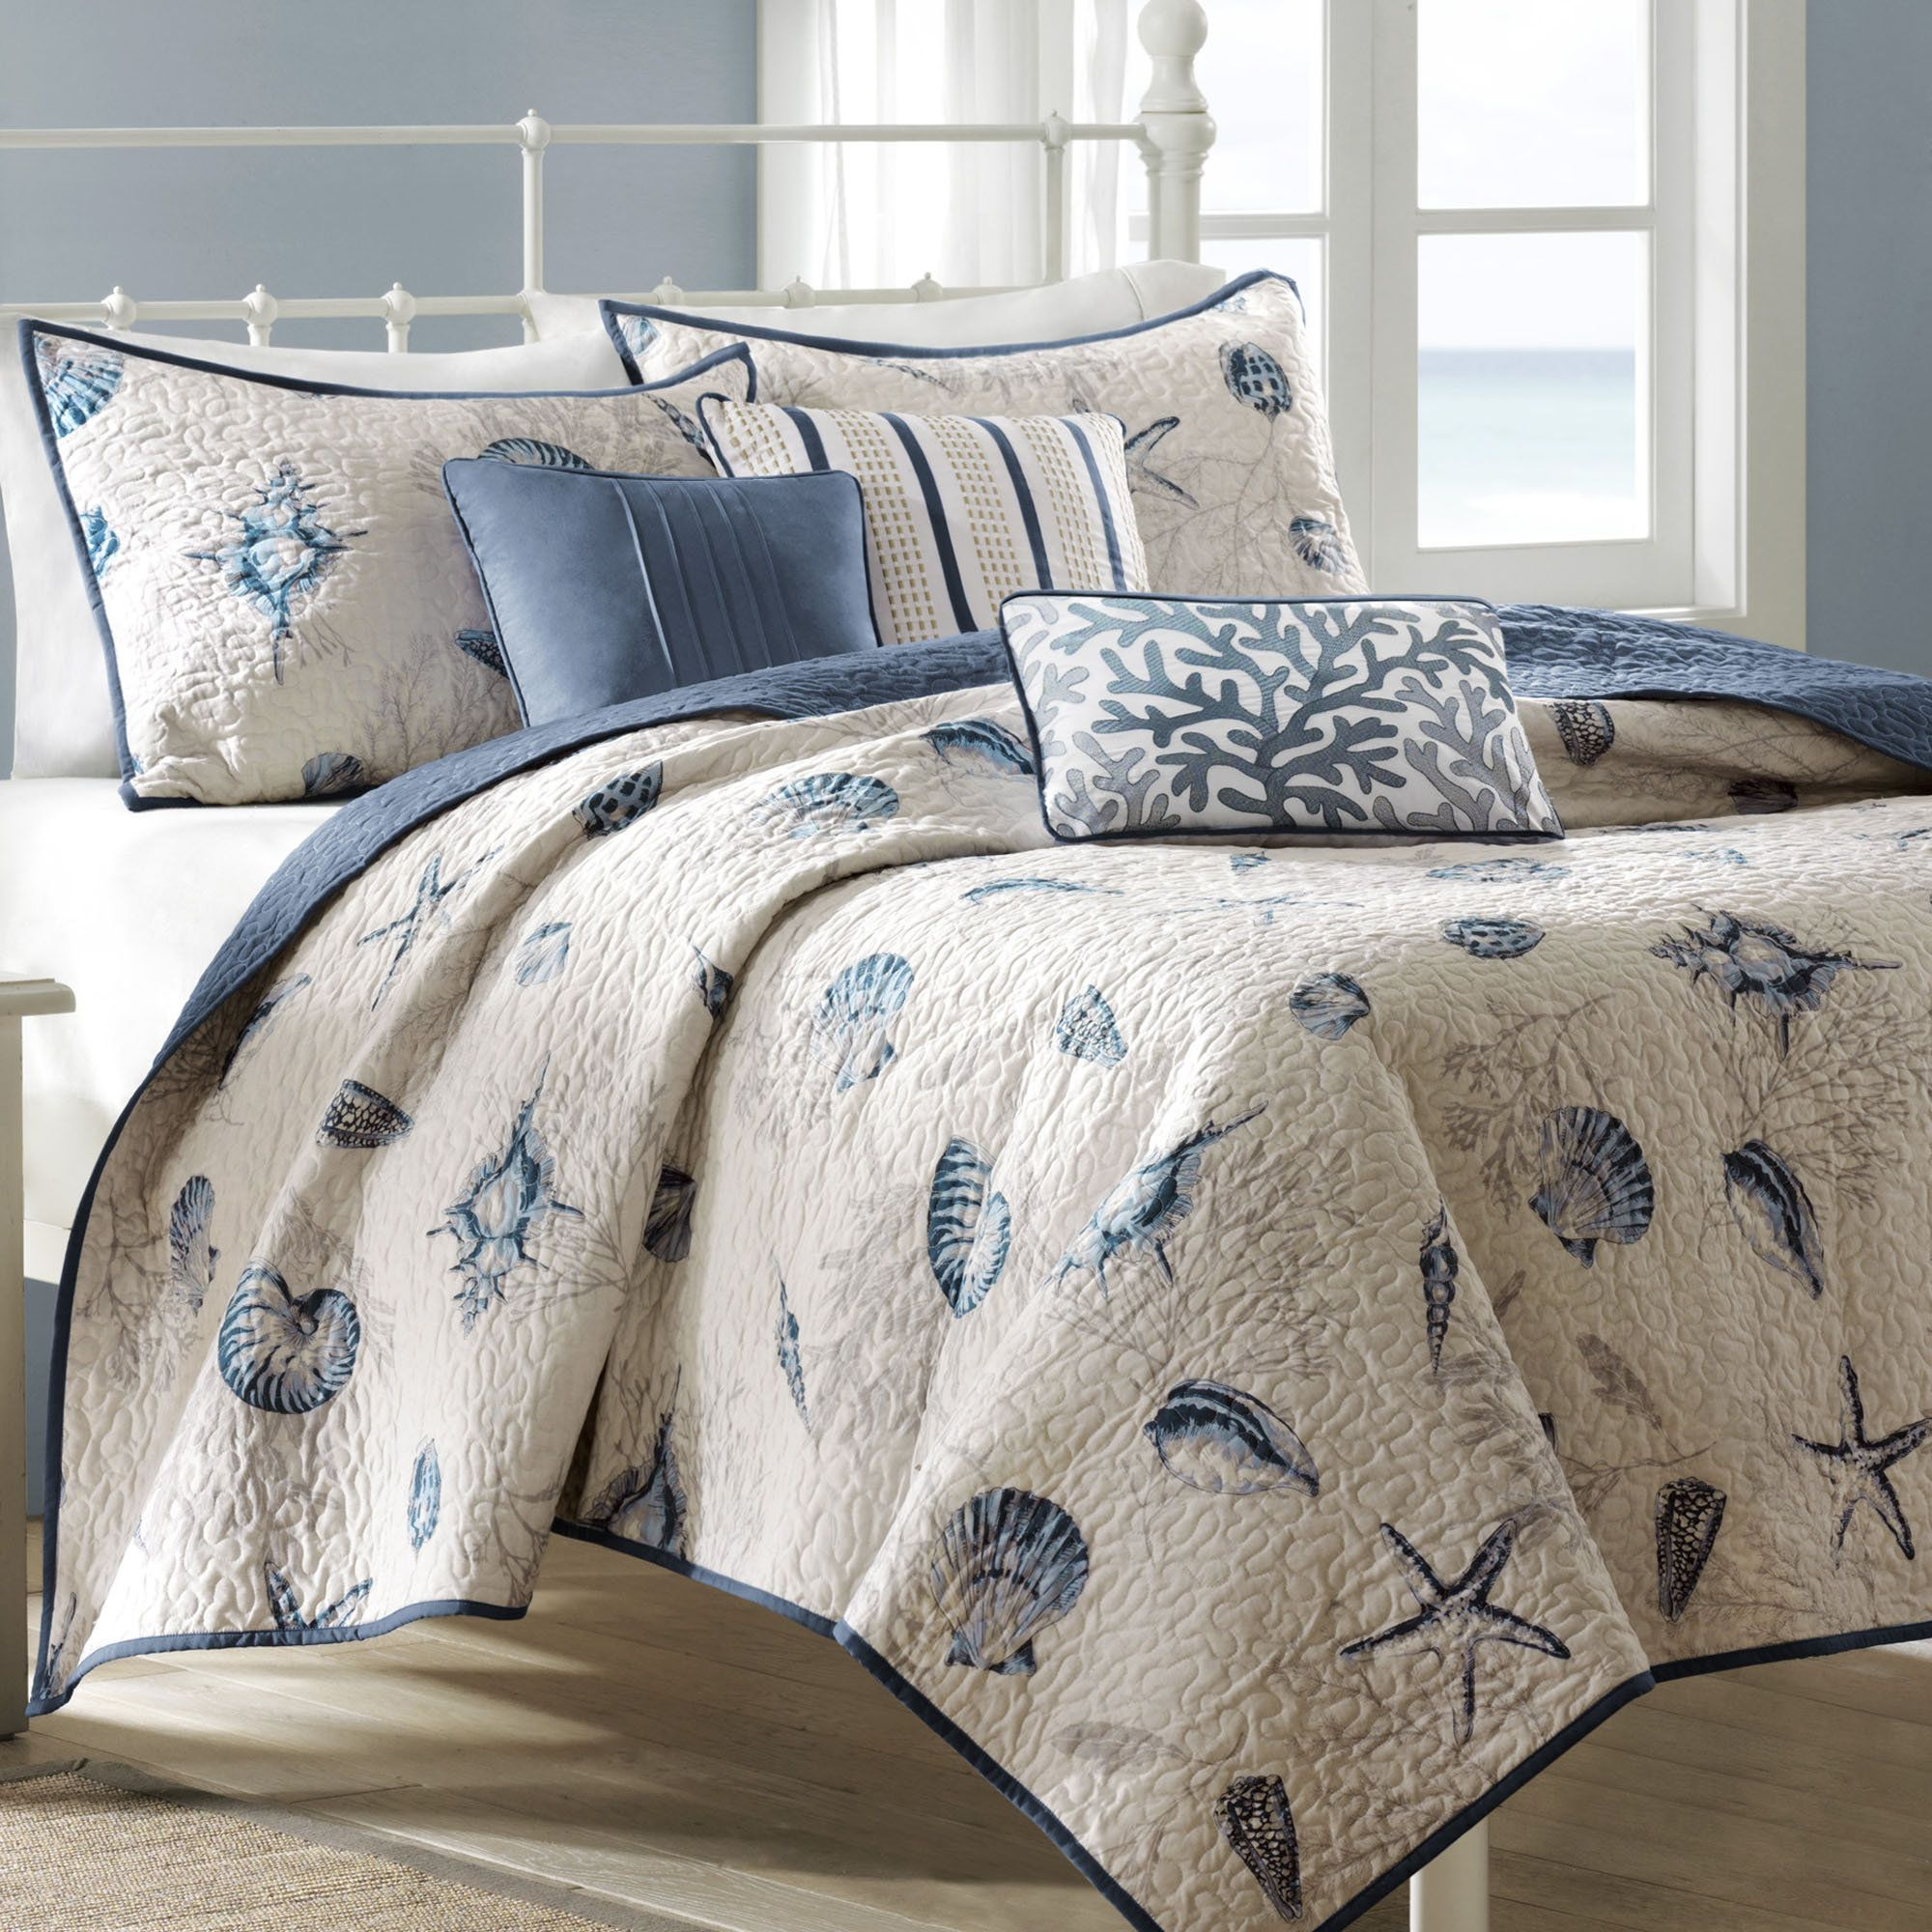 bedding sets cotton picture nautica comforter ebay set queen of b p full blue booker nautical